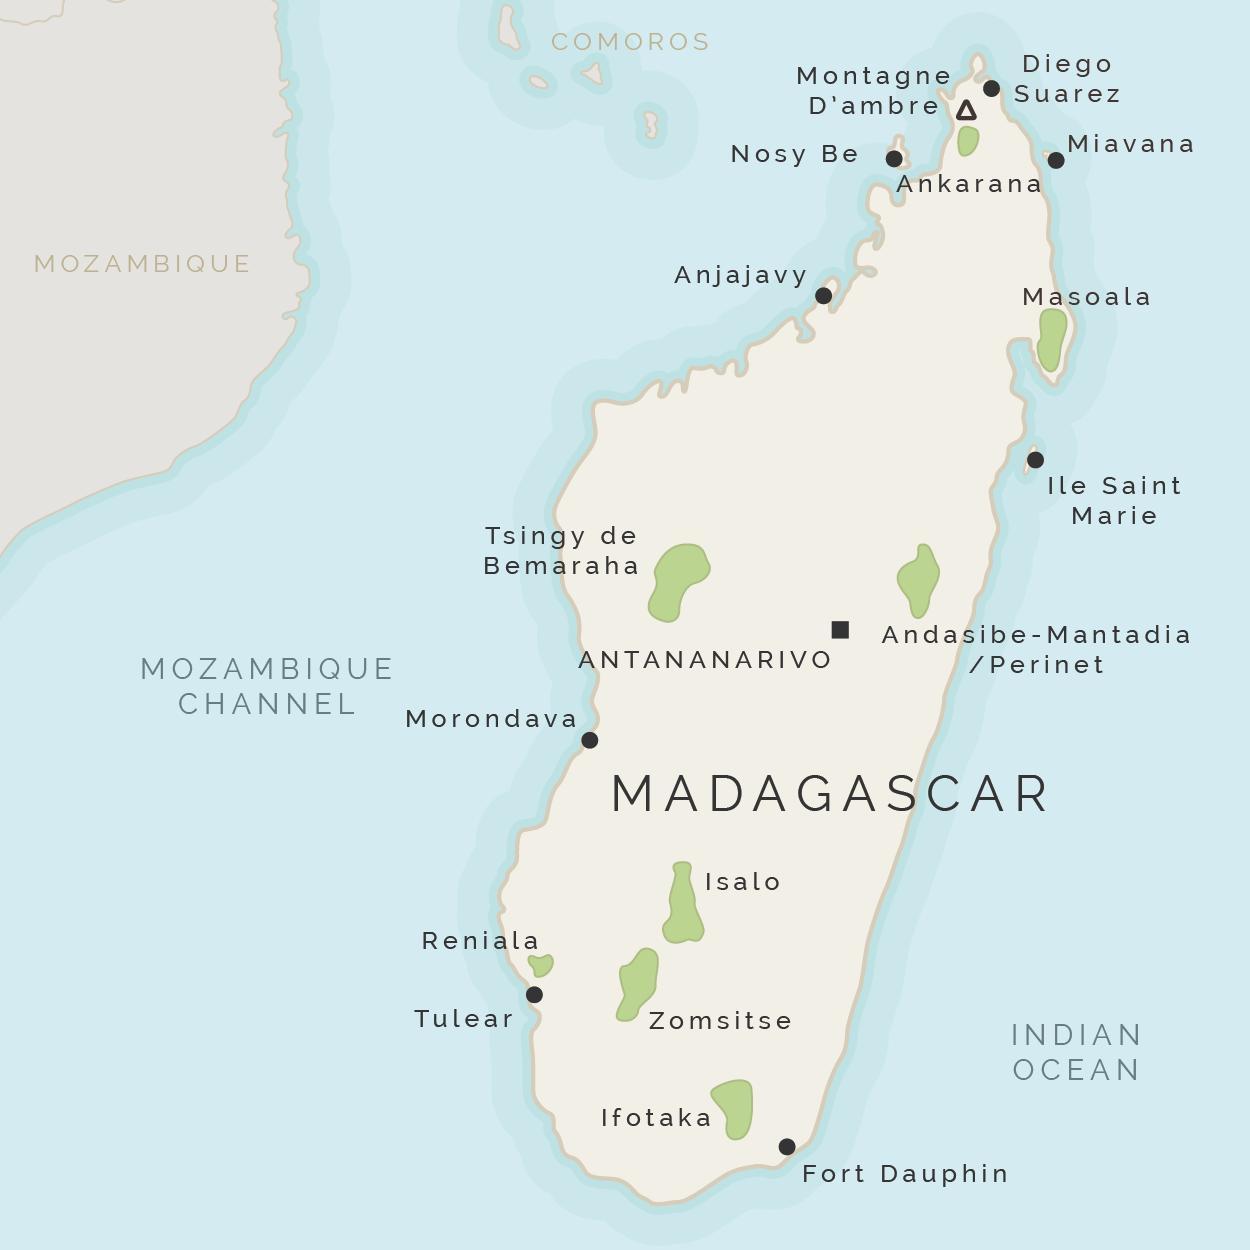 Isla De Madagascar Mapa.Madagascar La Isla De Mapa Mapa De Madagascar Y Las Islas De Los Alrededores Africa Oriental Y Africa